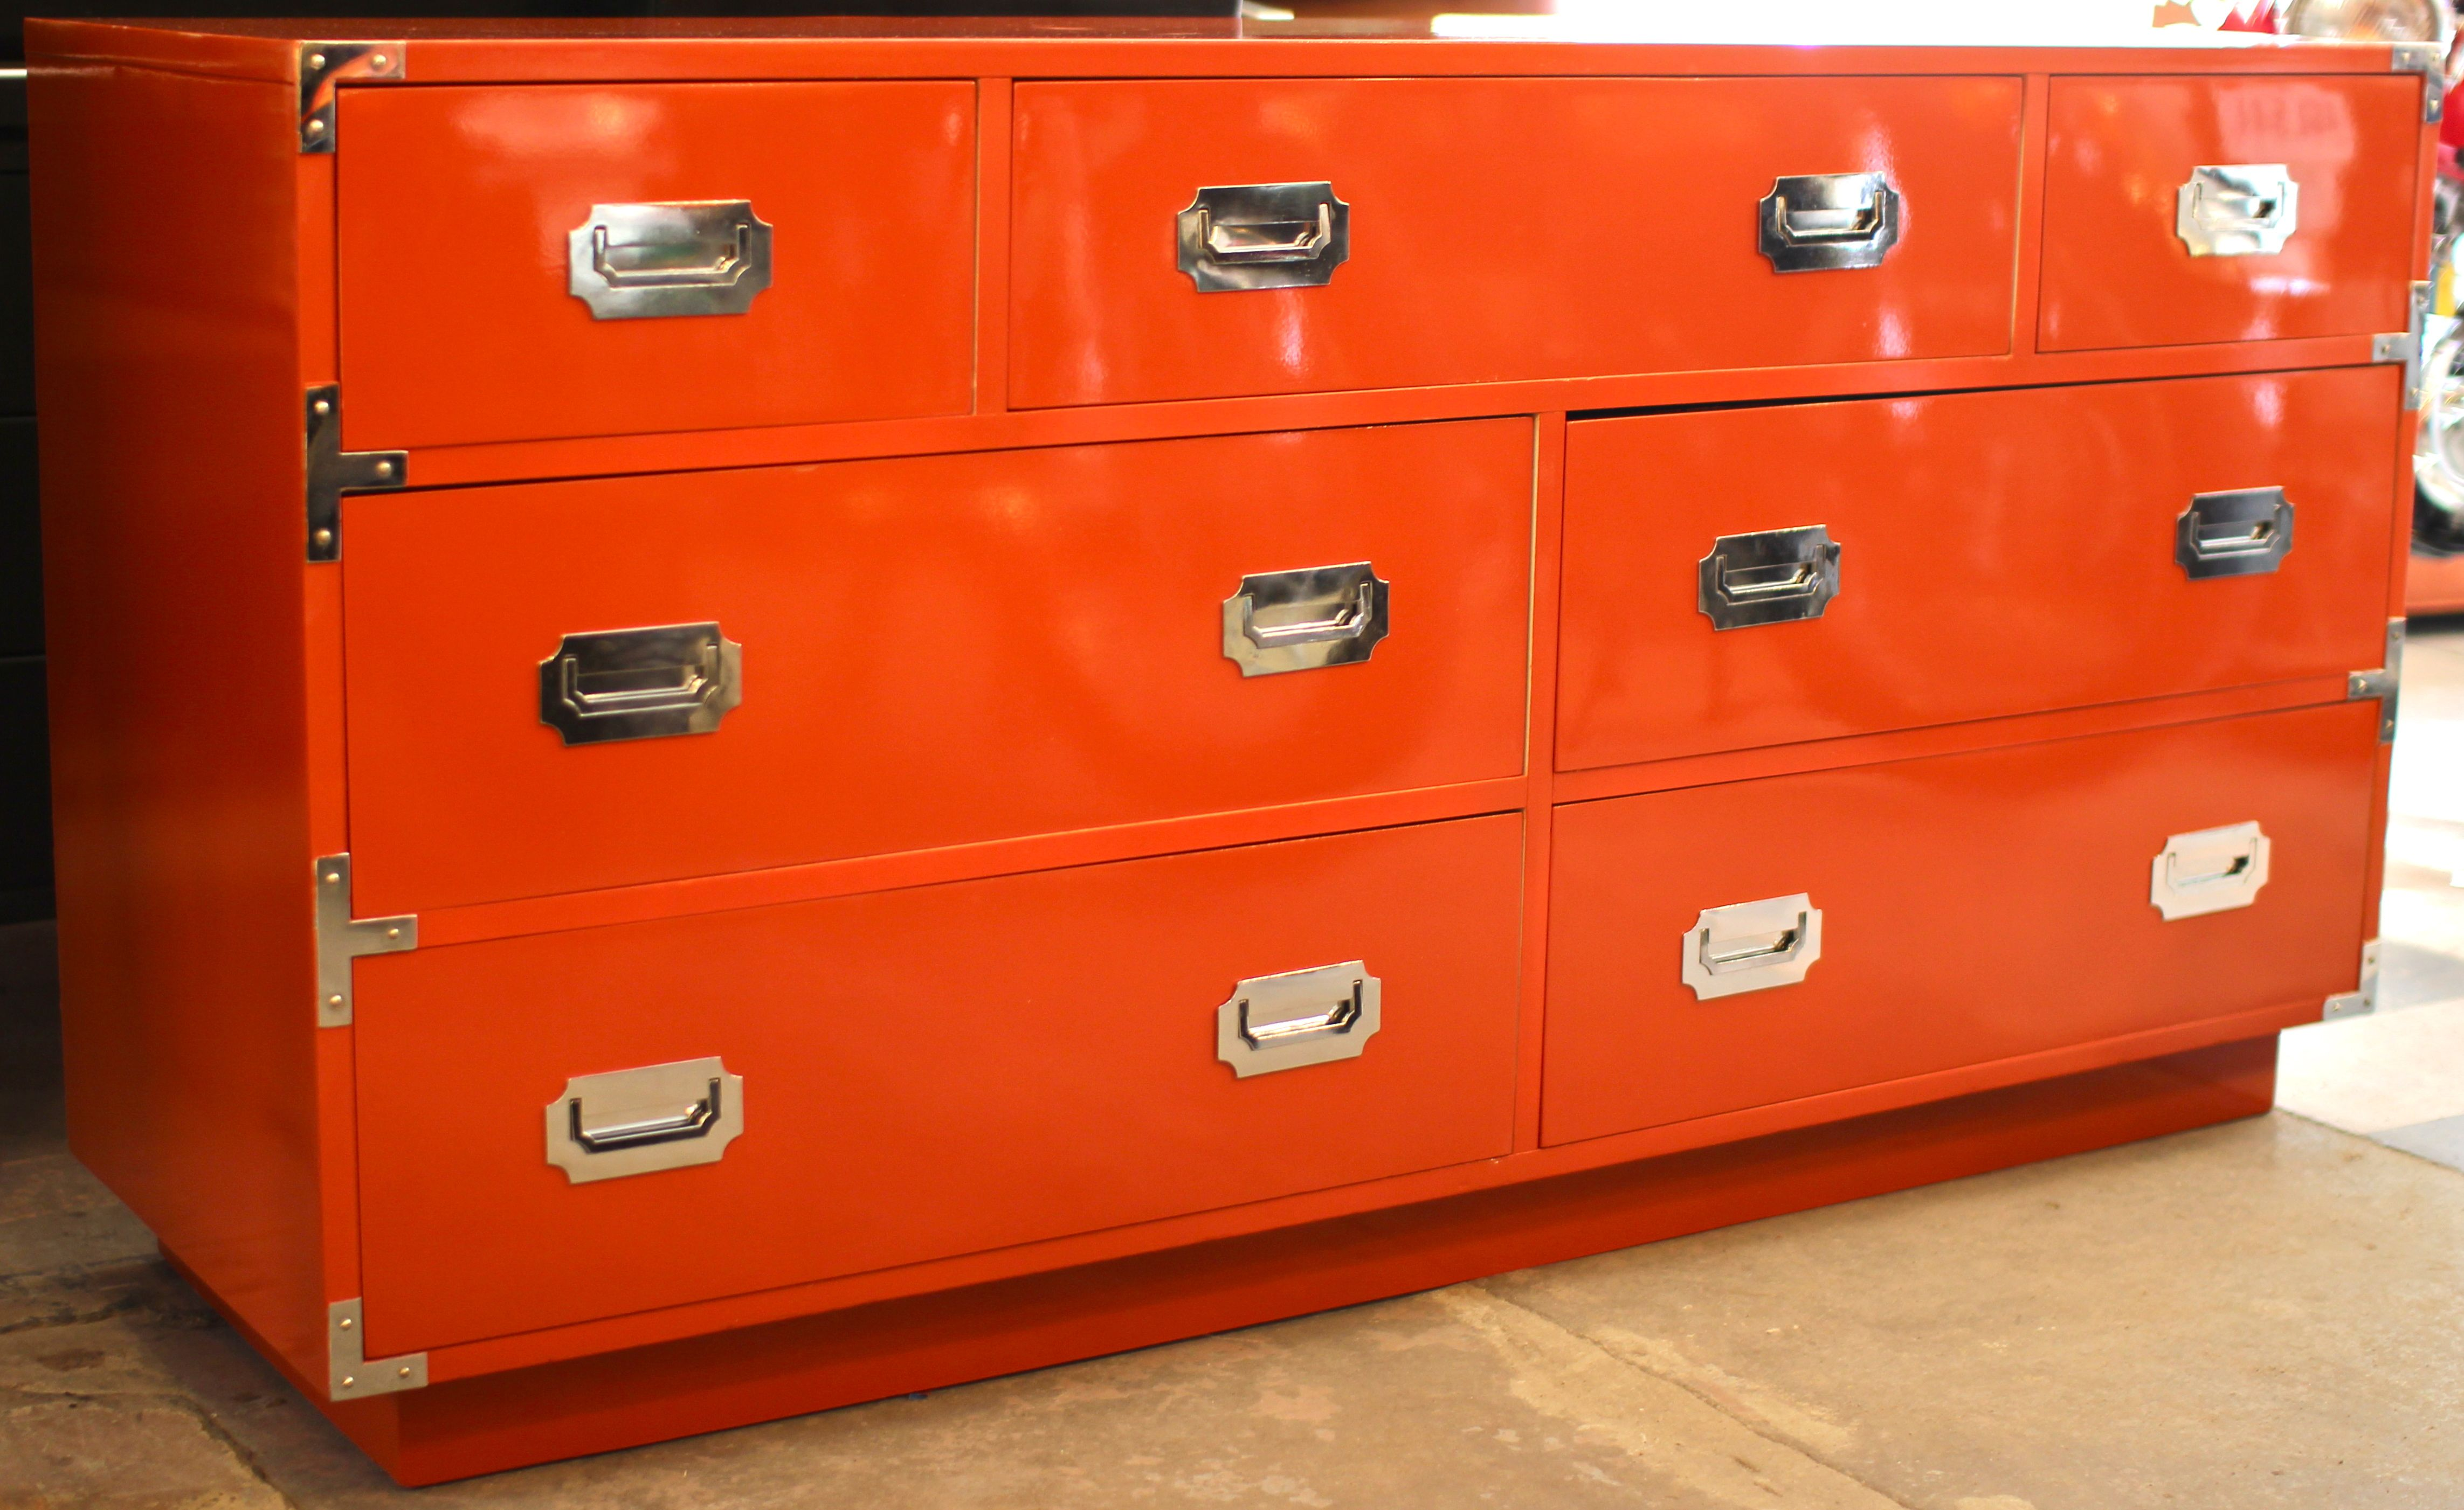 Orange Lacquer Campaign Style Chest Mid Century Modern Furniture Houston Modernism Mod Mcm M Campaign Style Furniture Houston Furniture Campaign Furniture